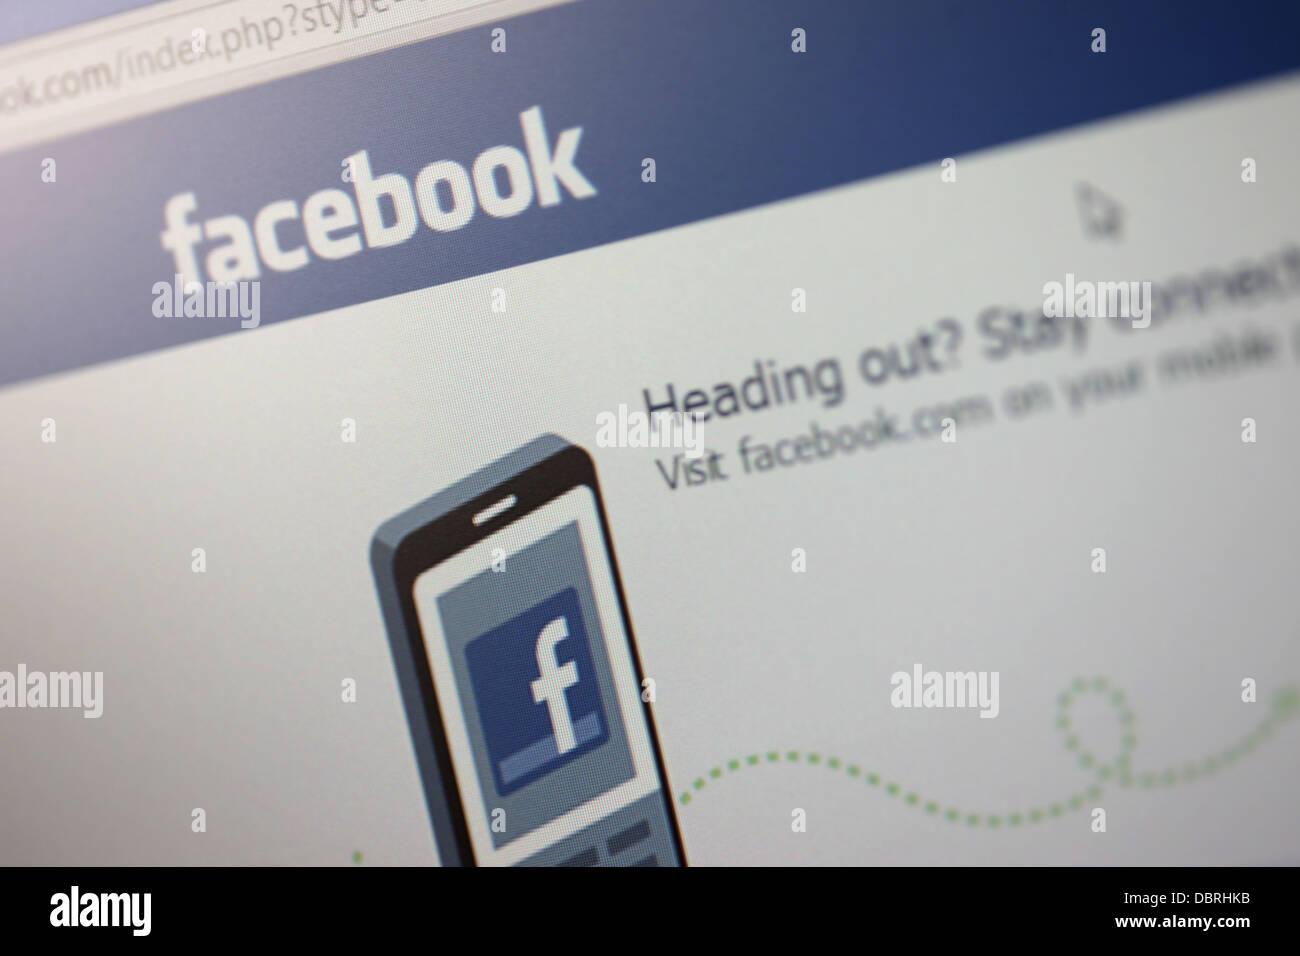 Facebook Homepage - Stock Image